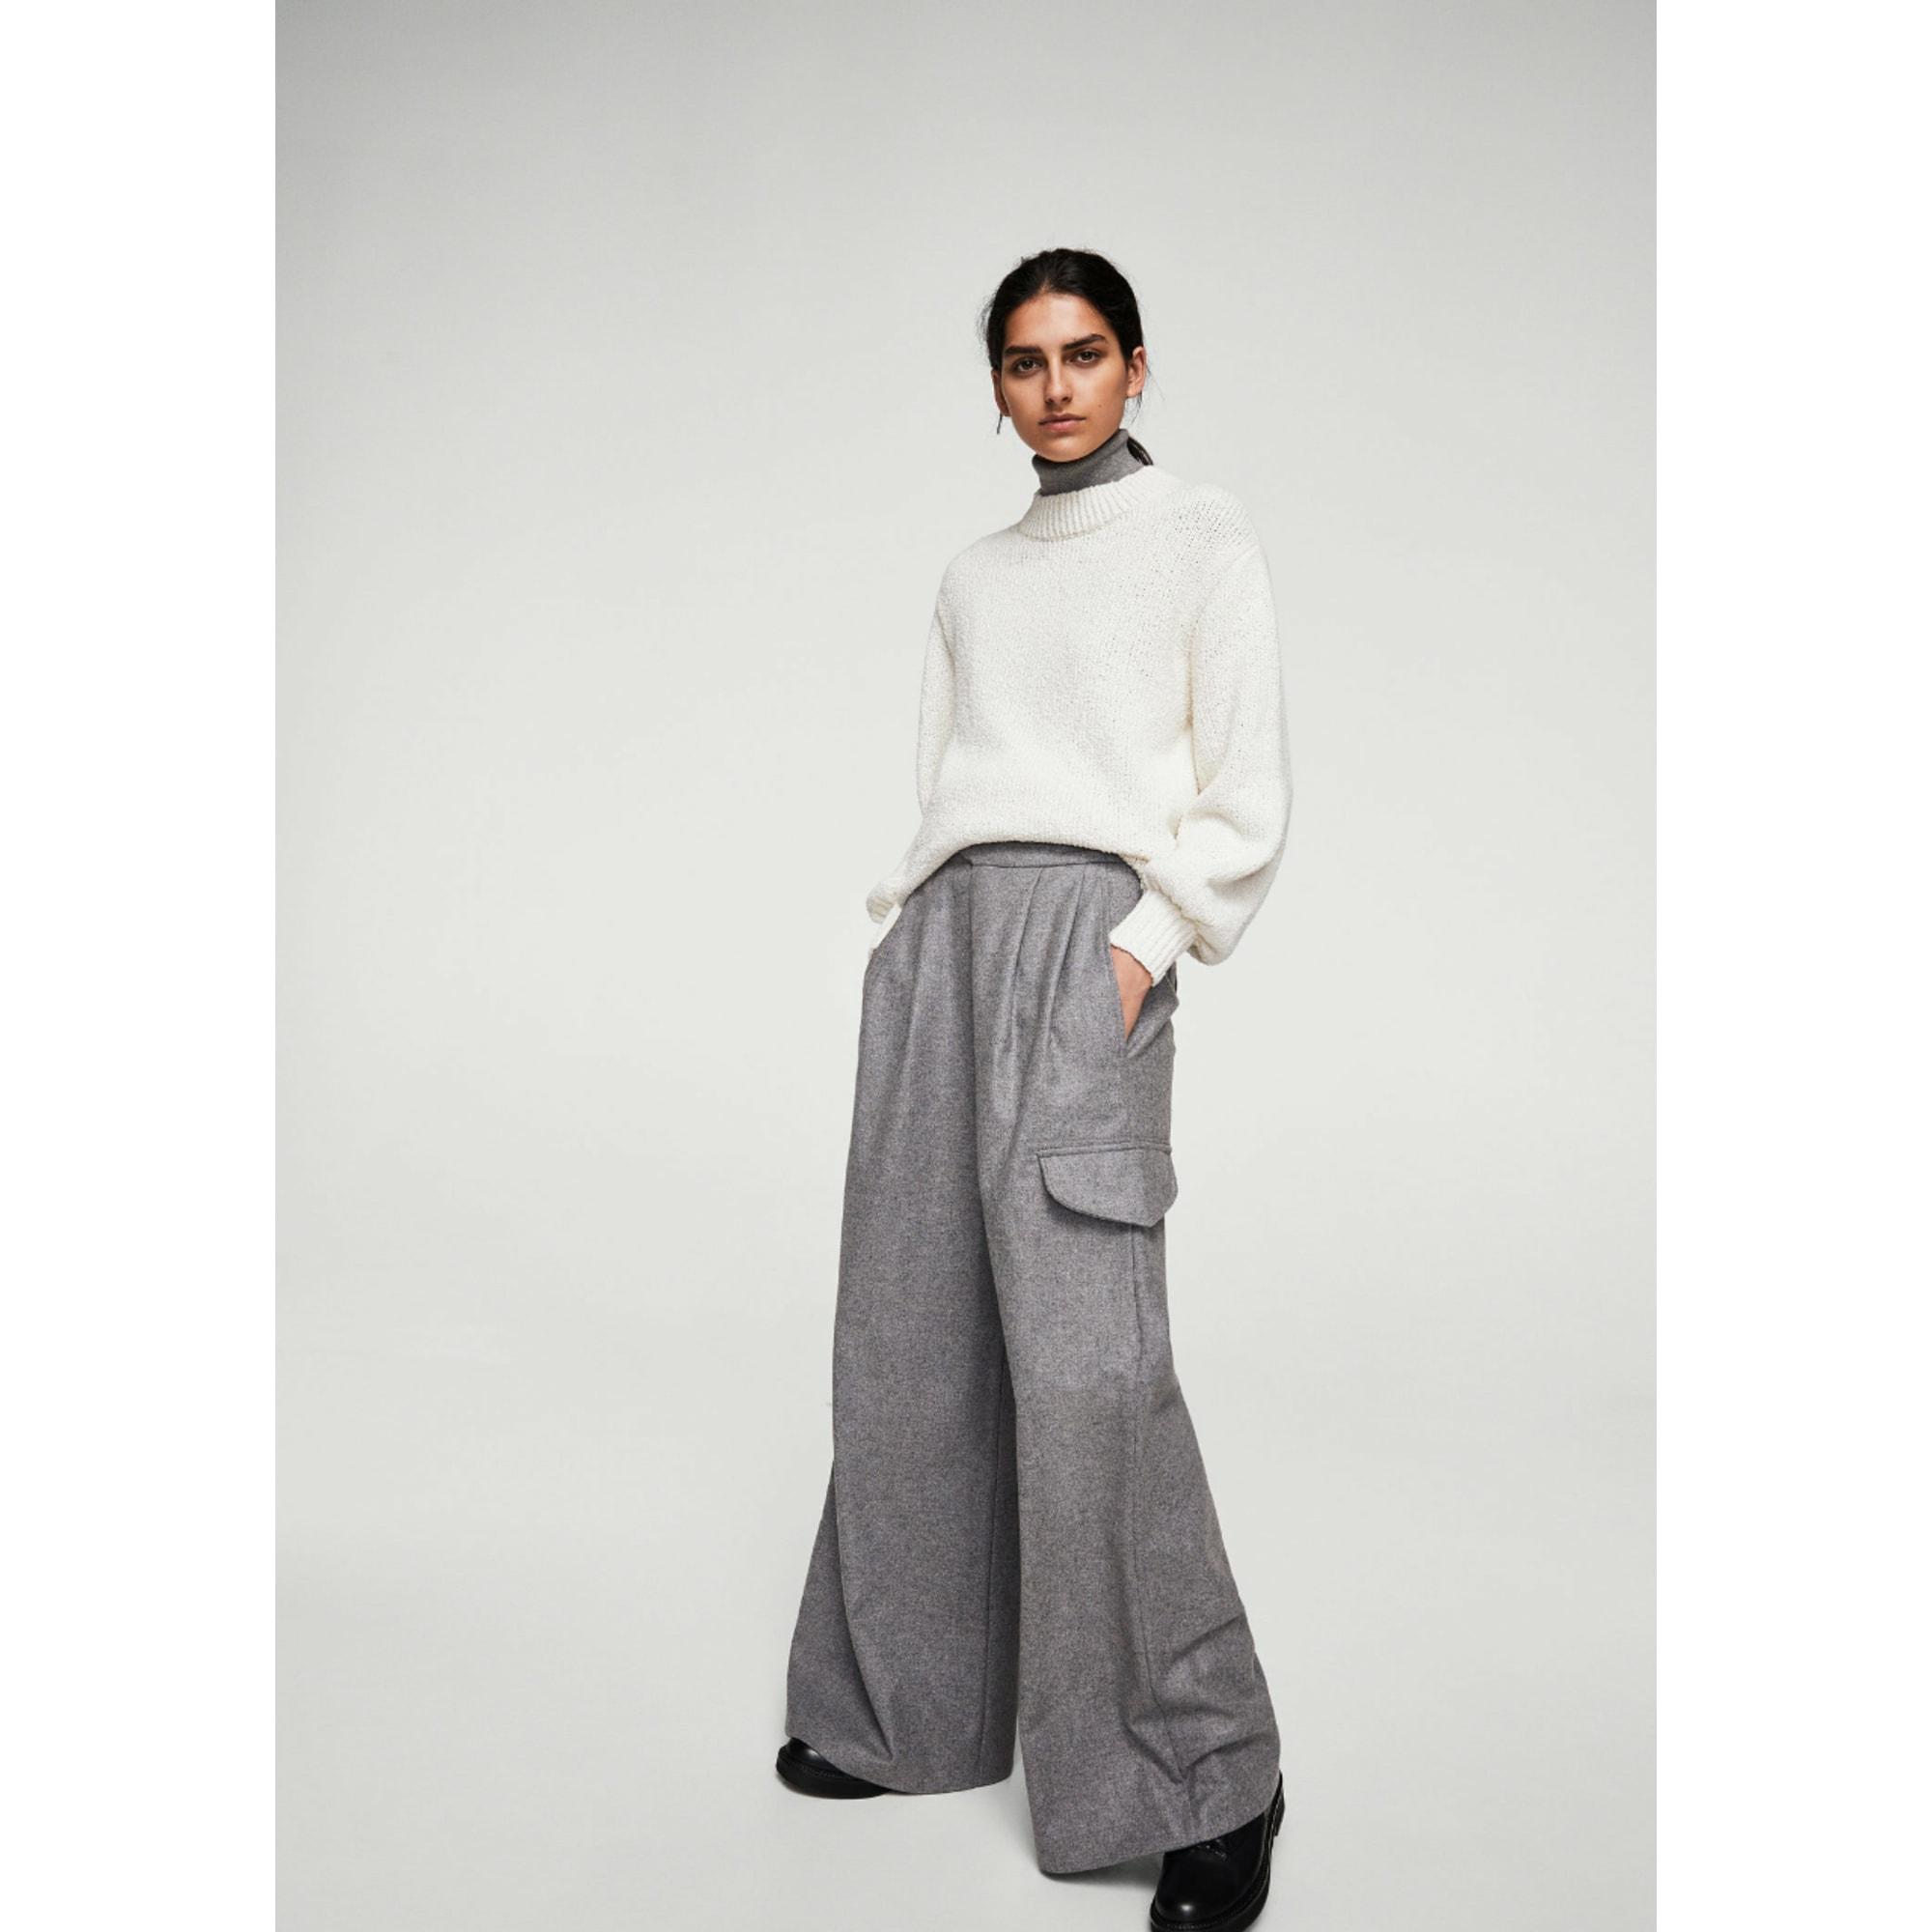 Pantalon large Mango taille haute 38